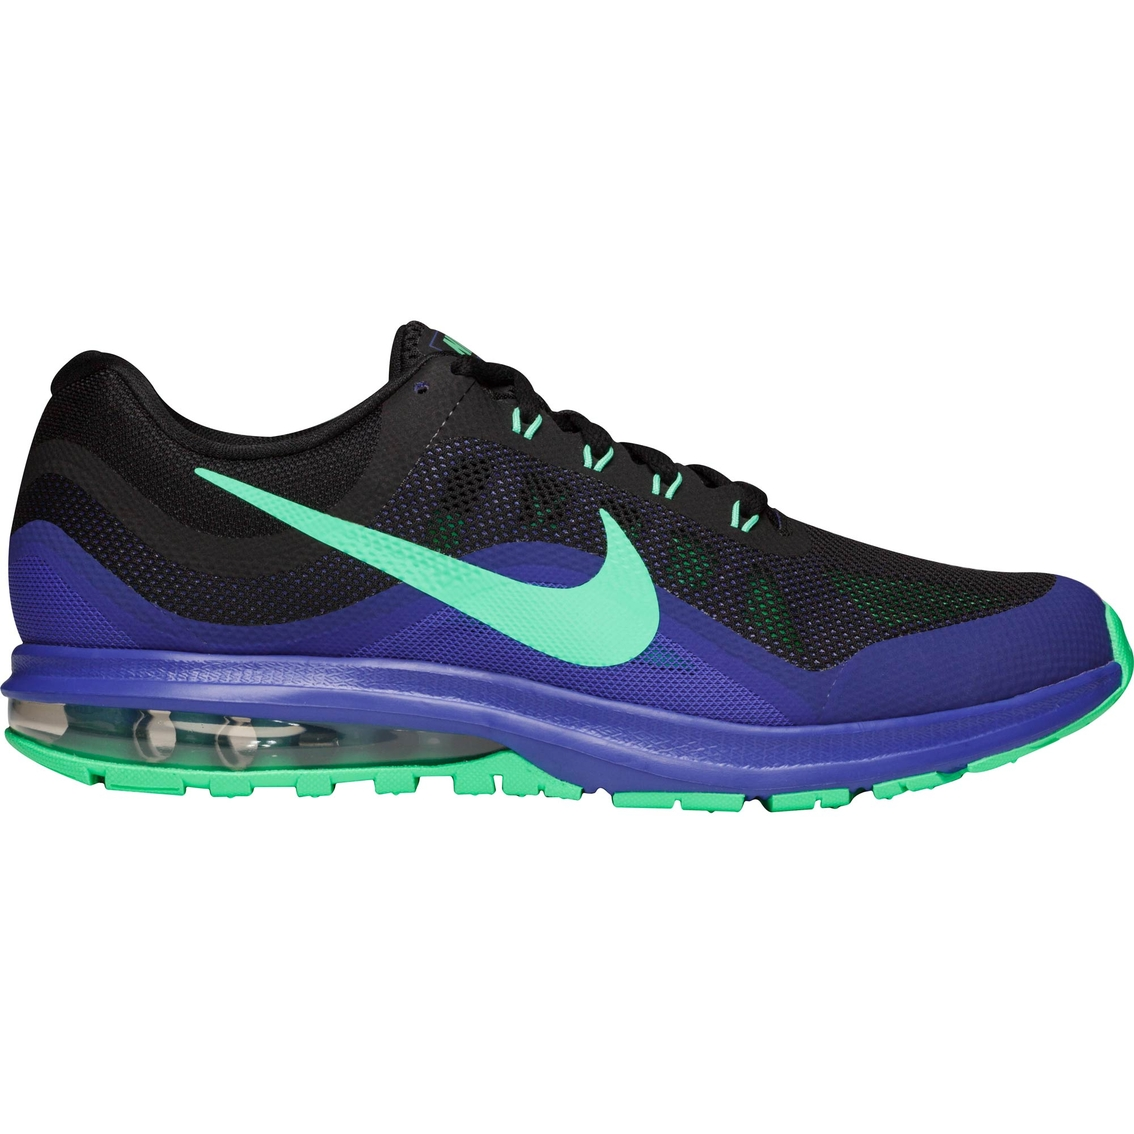 07bd02a306b2 Nike Men s Air Max Dynasty 2 Running Shoes